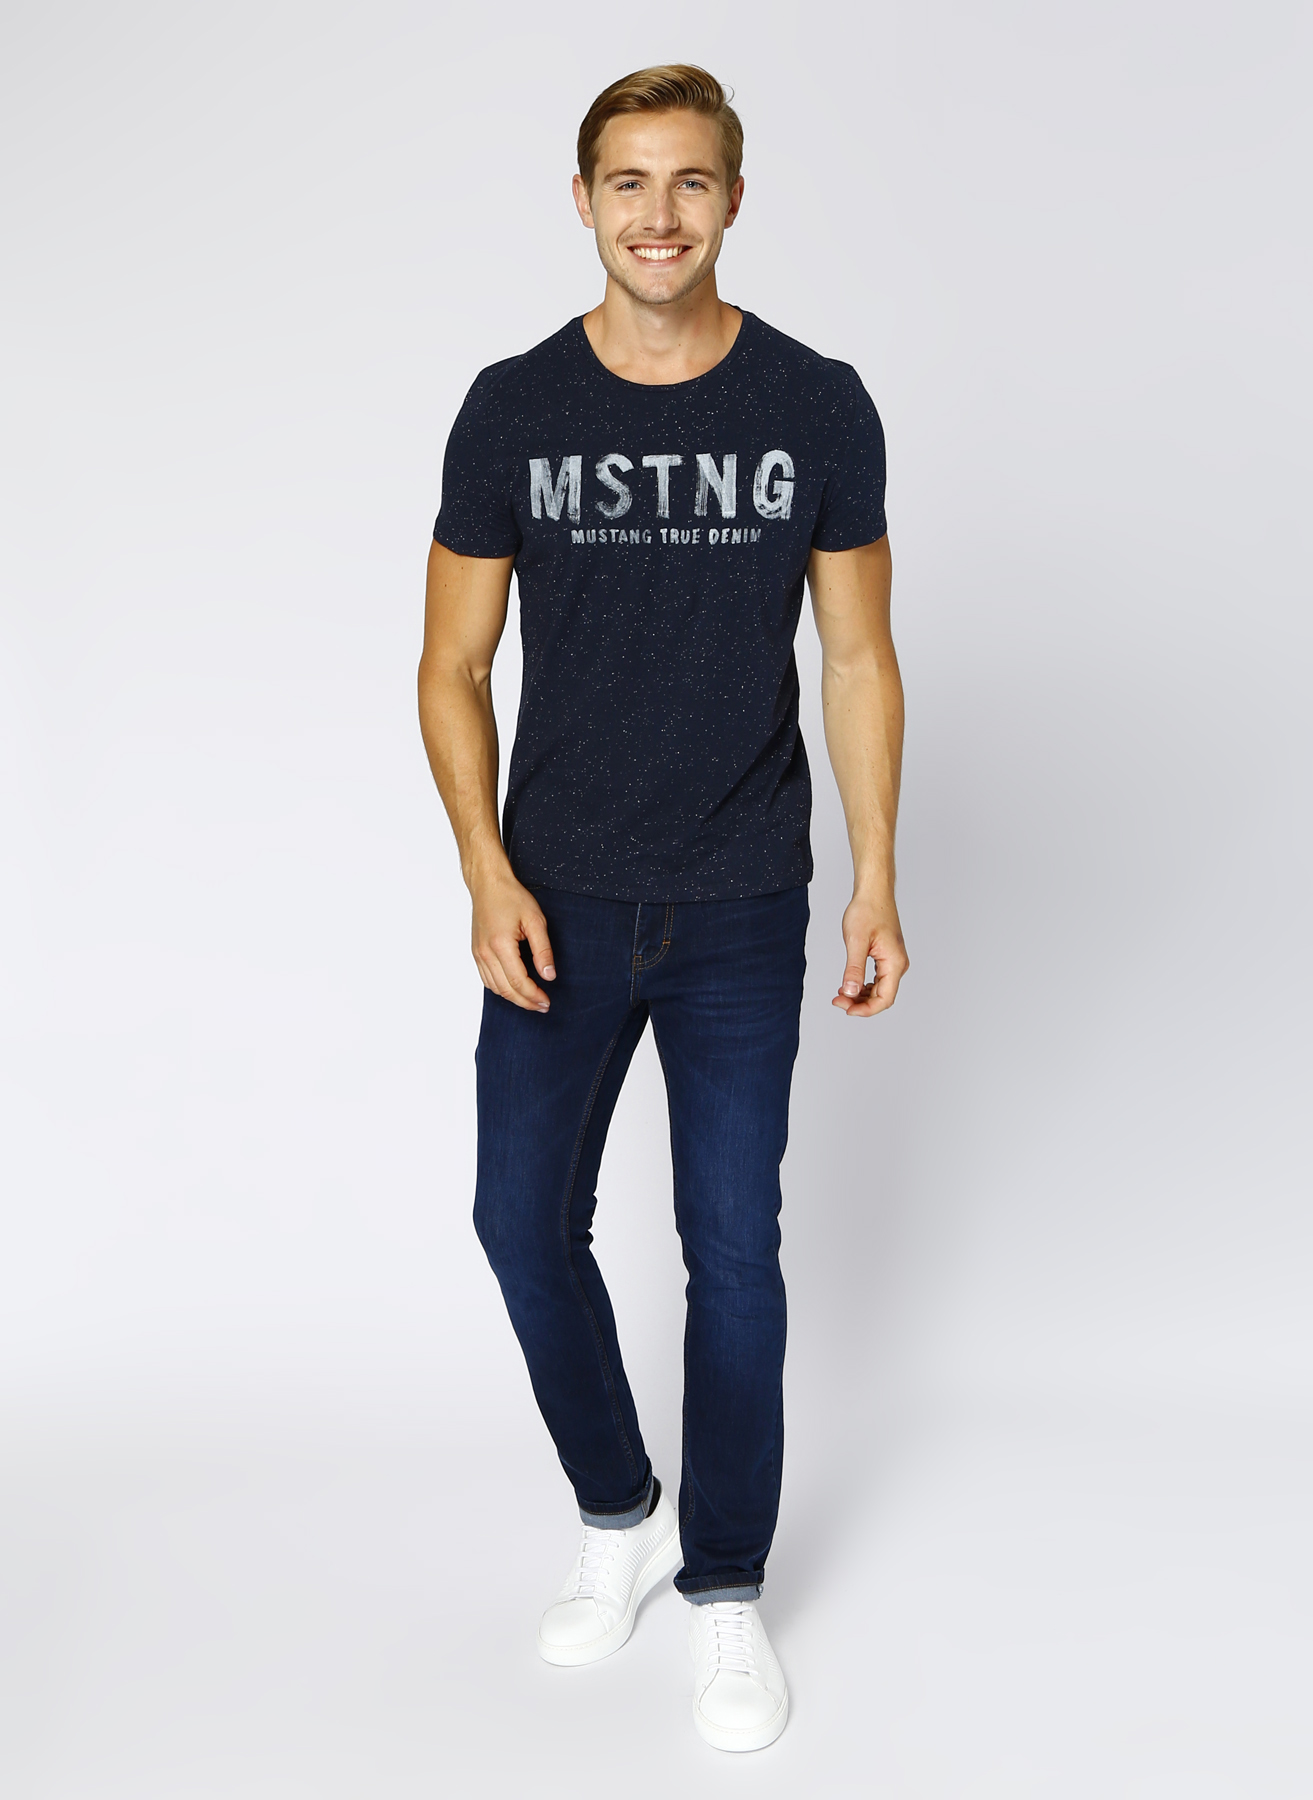 Mustang T-Shirt XL 5001702335001 Ürün Resmi